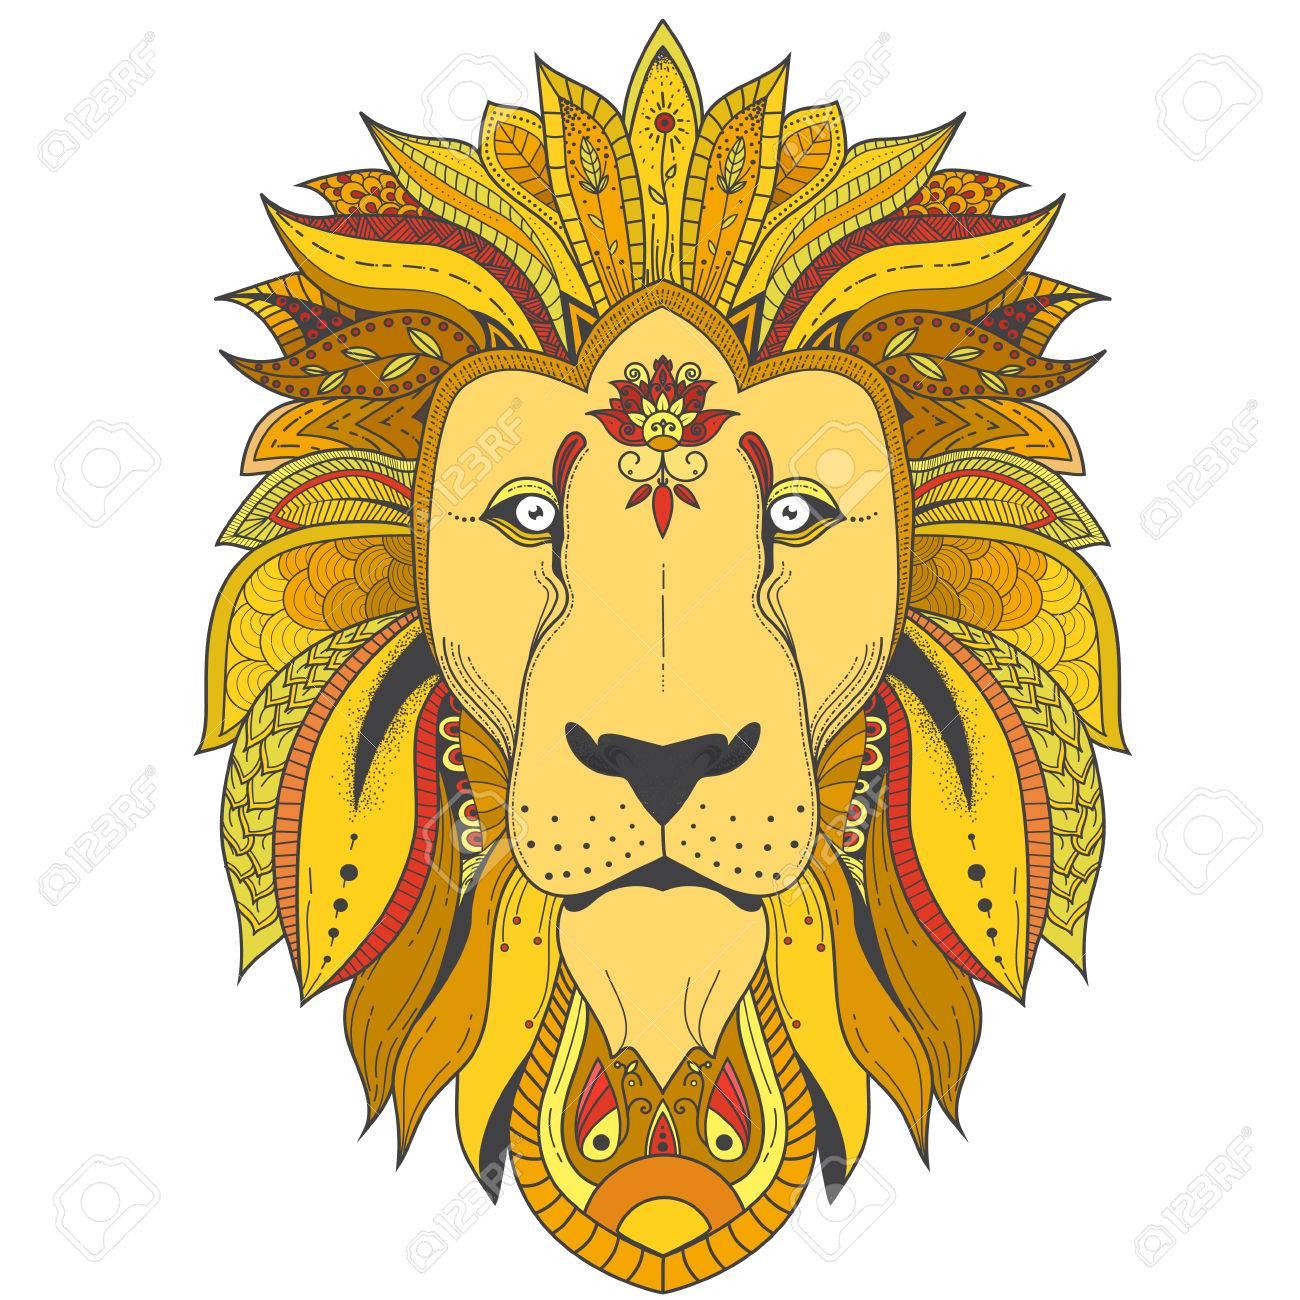 Farbe Zenart Illustration Des Löwen Mit Stammes Mandala Muster